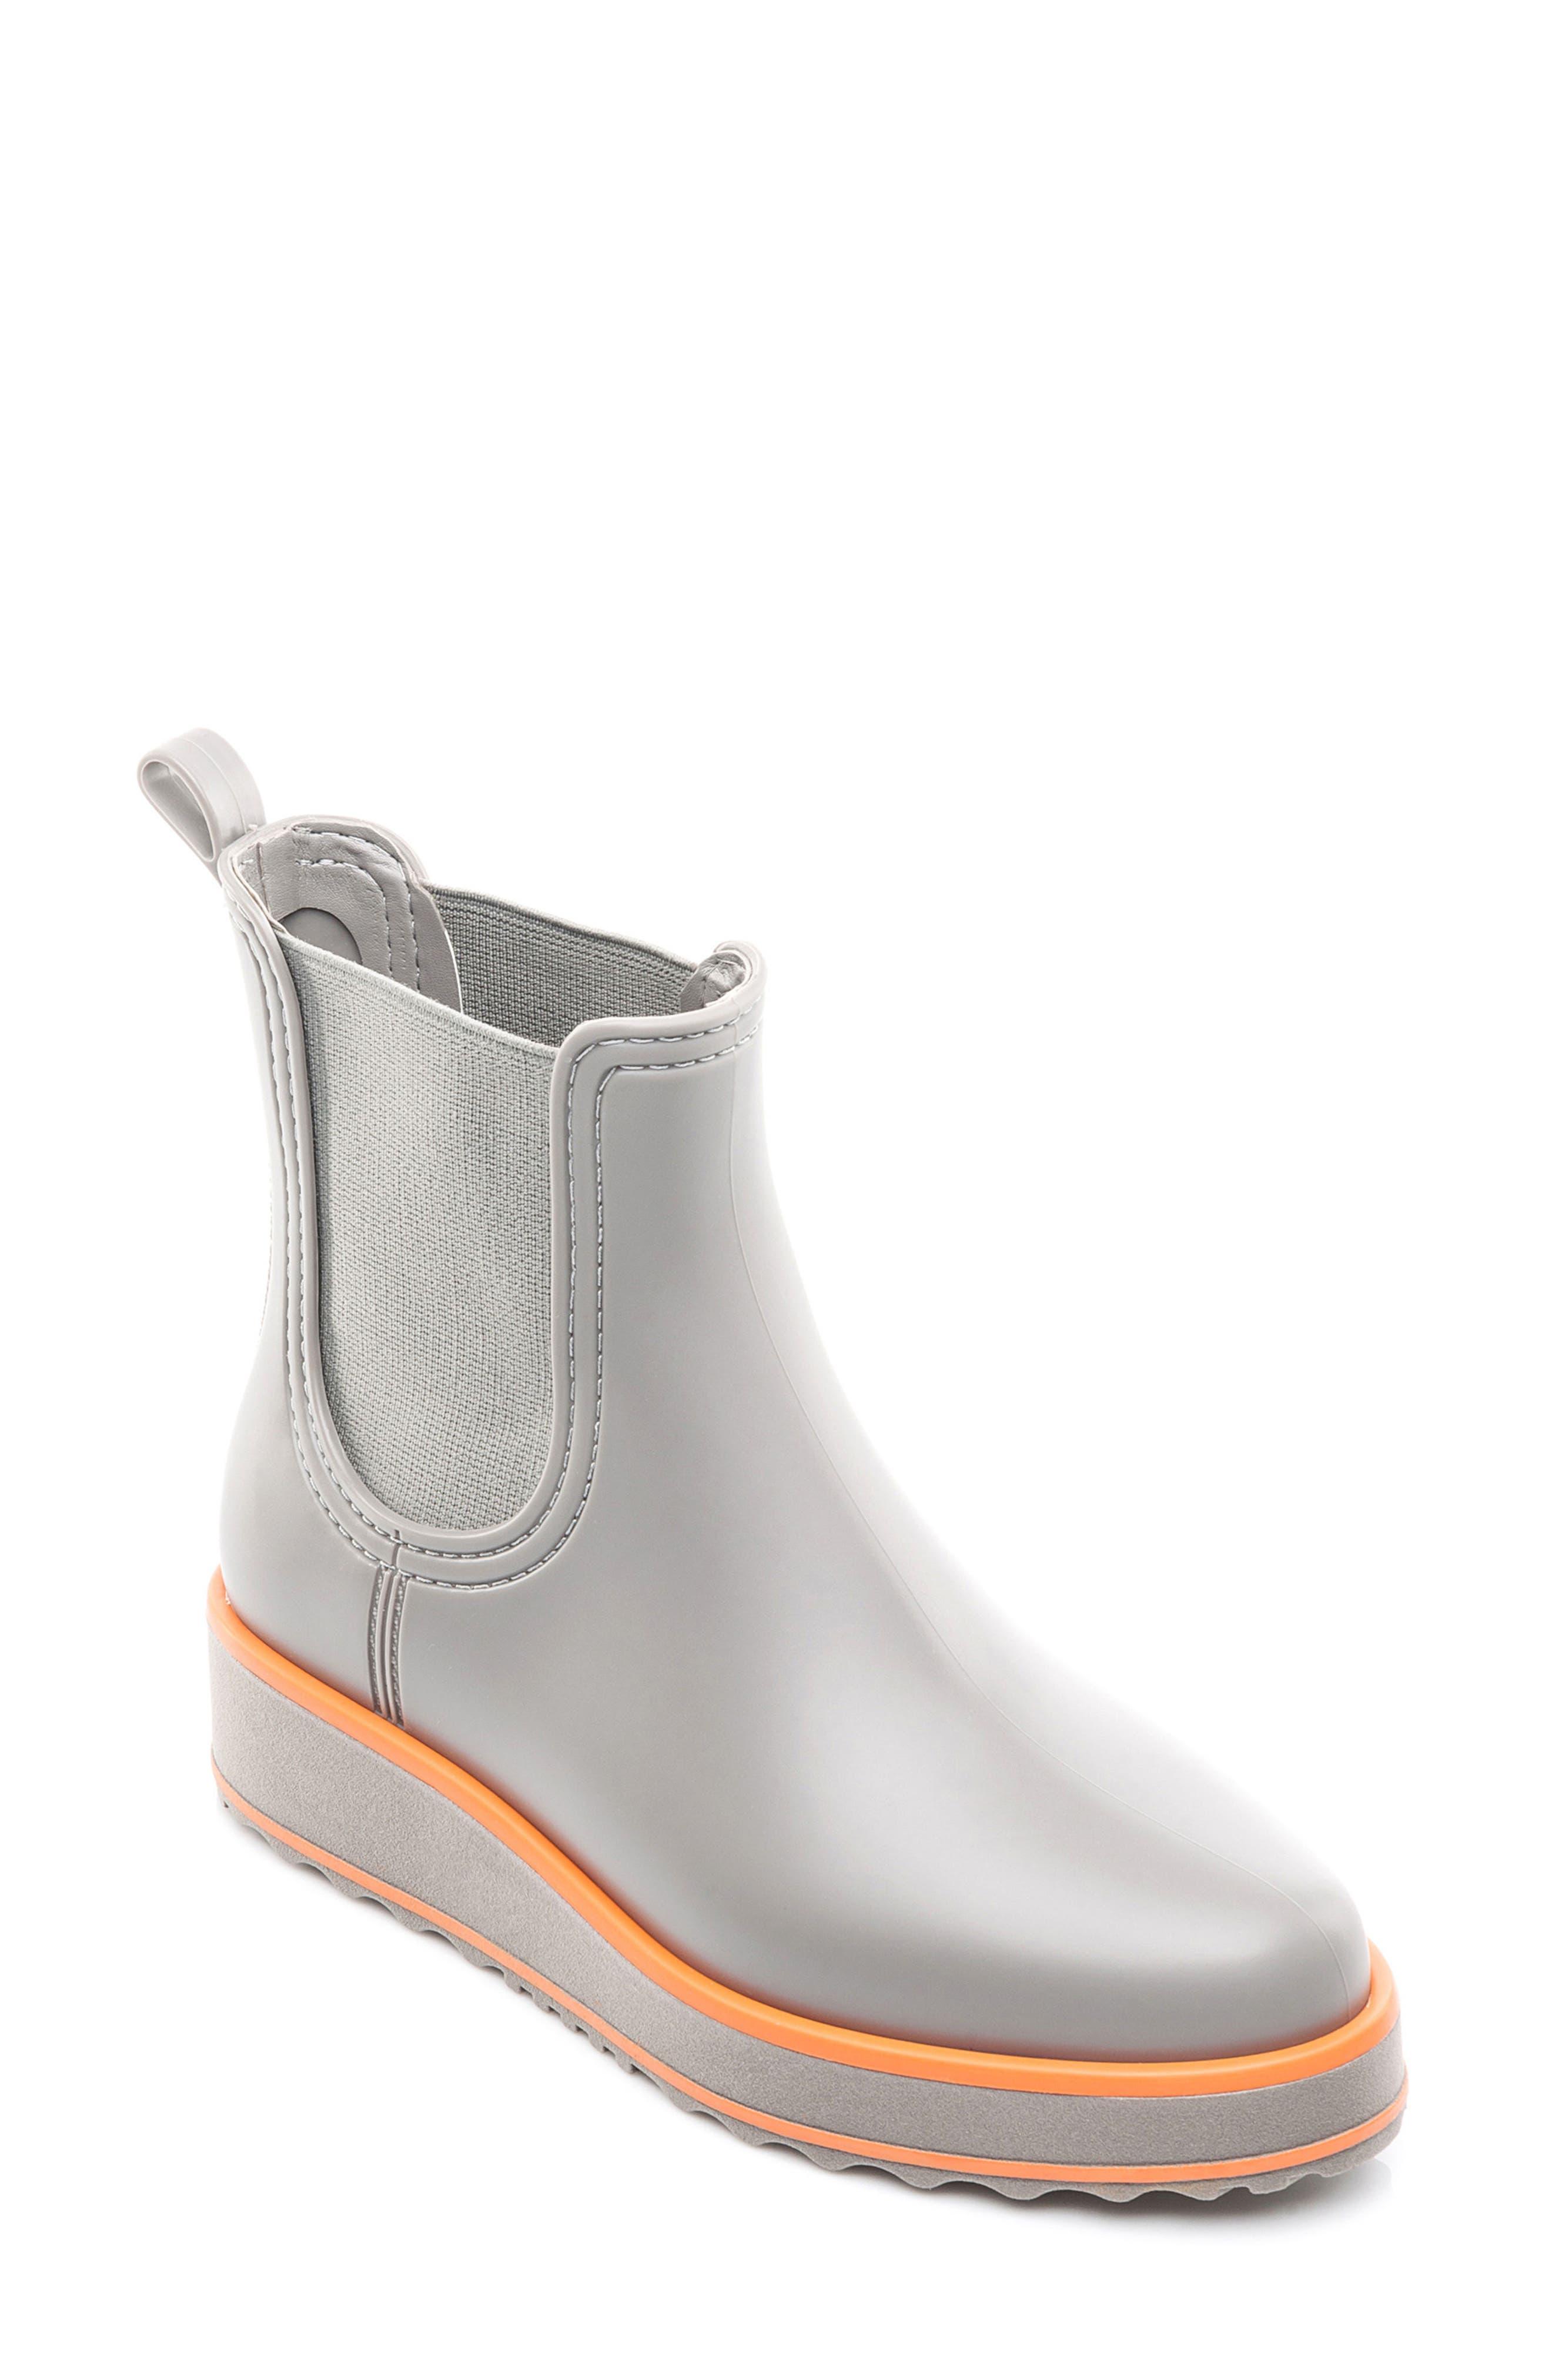 Alternate Image 1 Selected - Bernardo Footwear Wila Rain Boot (Women)